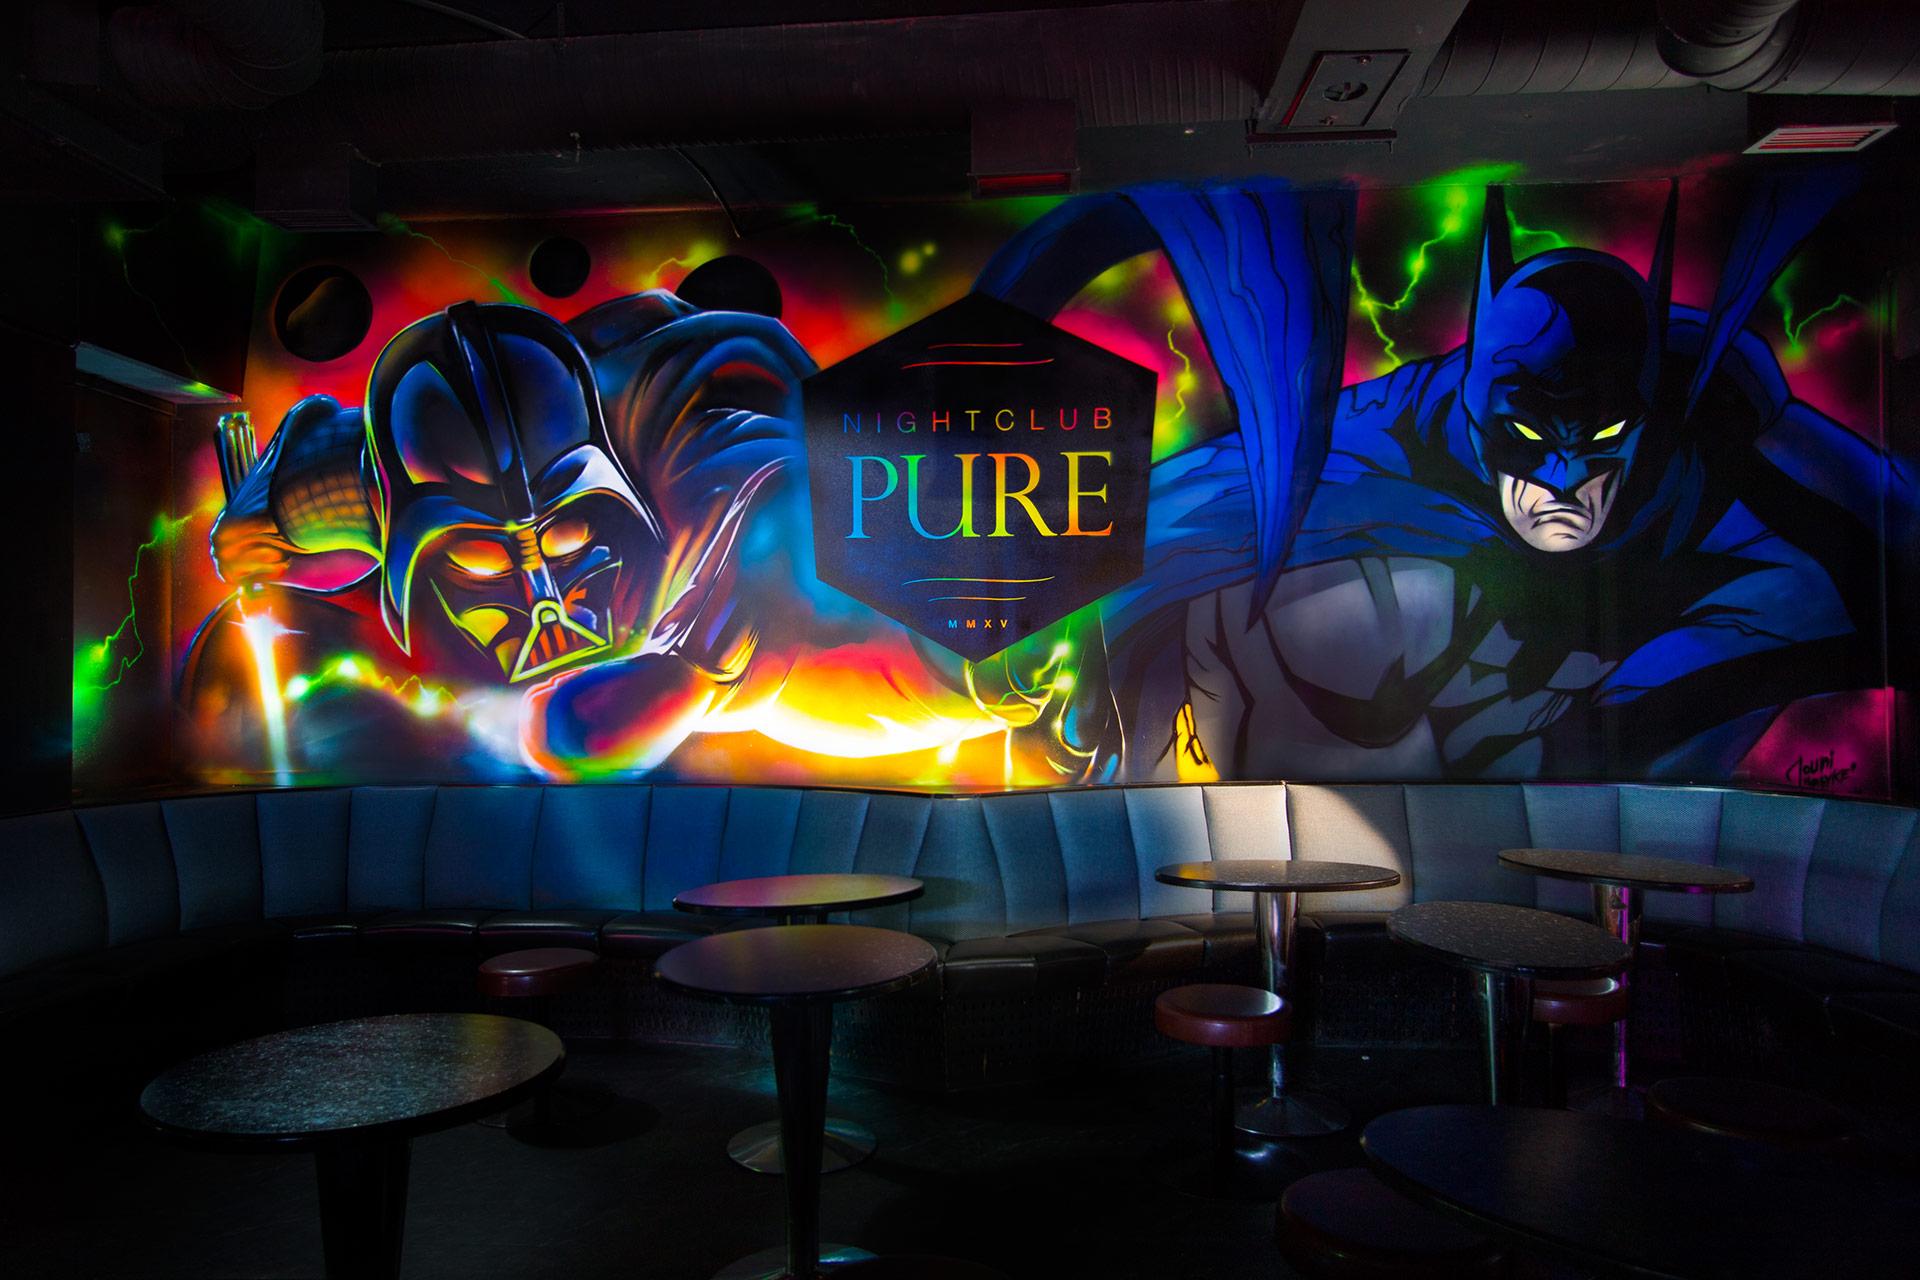 Nightclub Pure